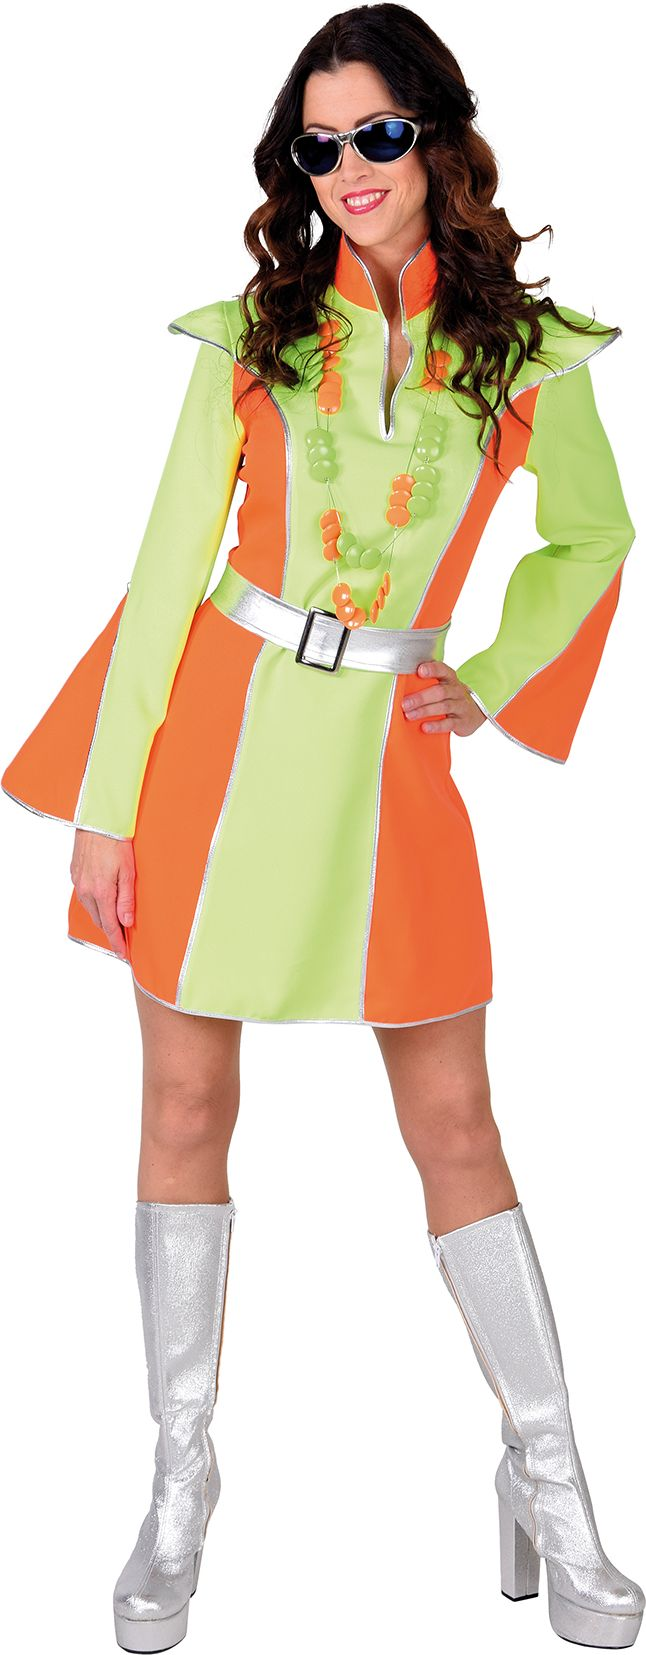 Fluor oranje groene disco jurk dames